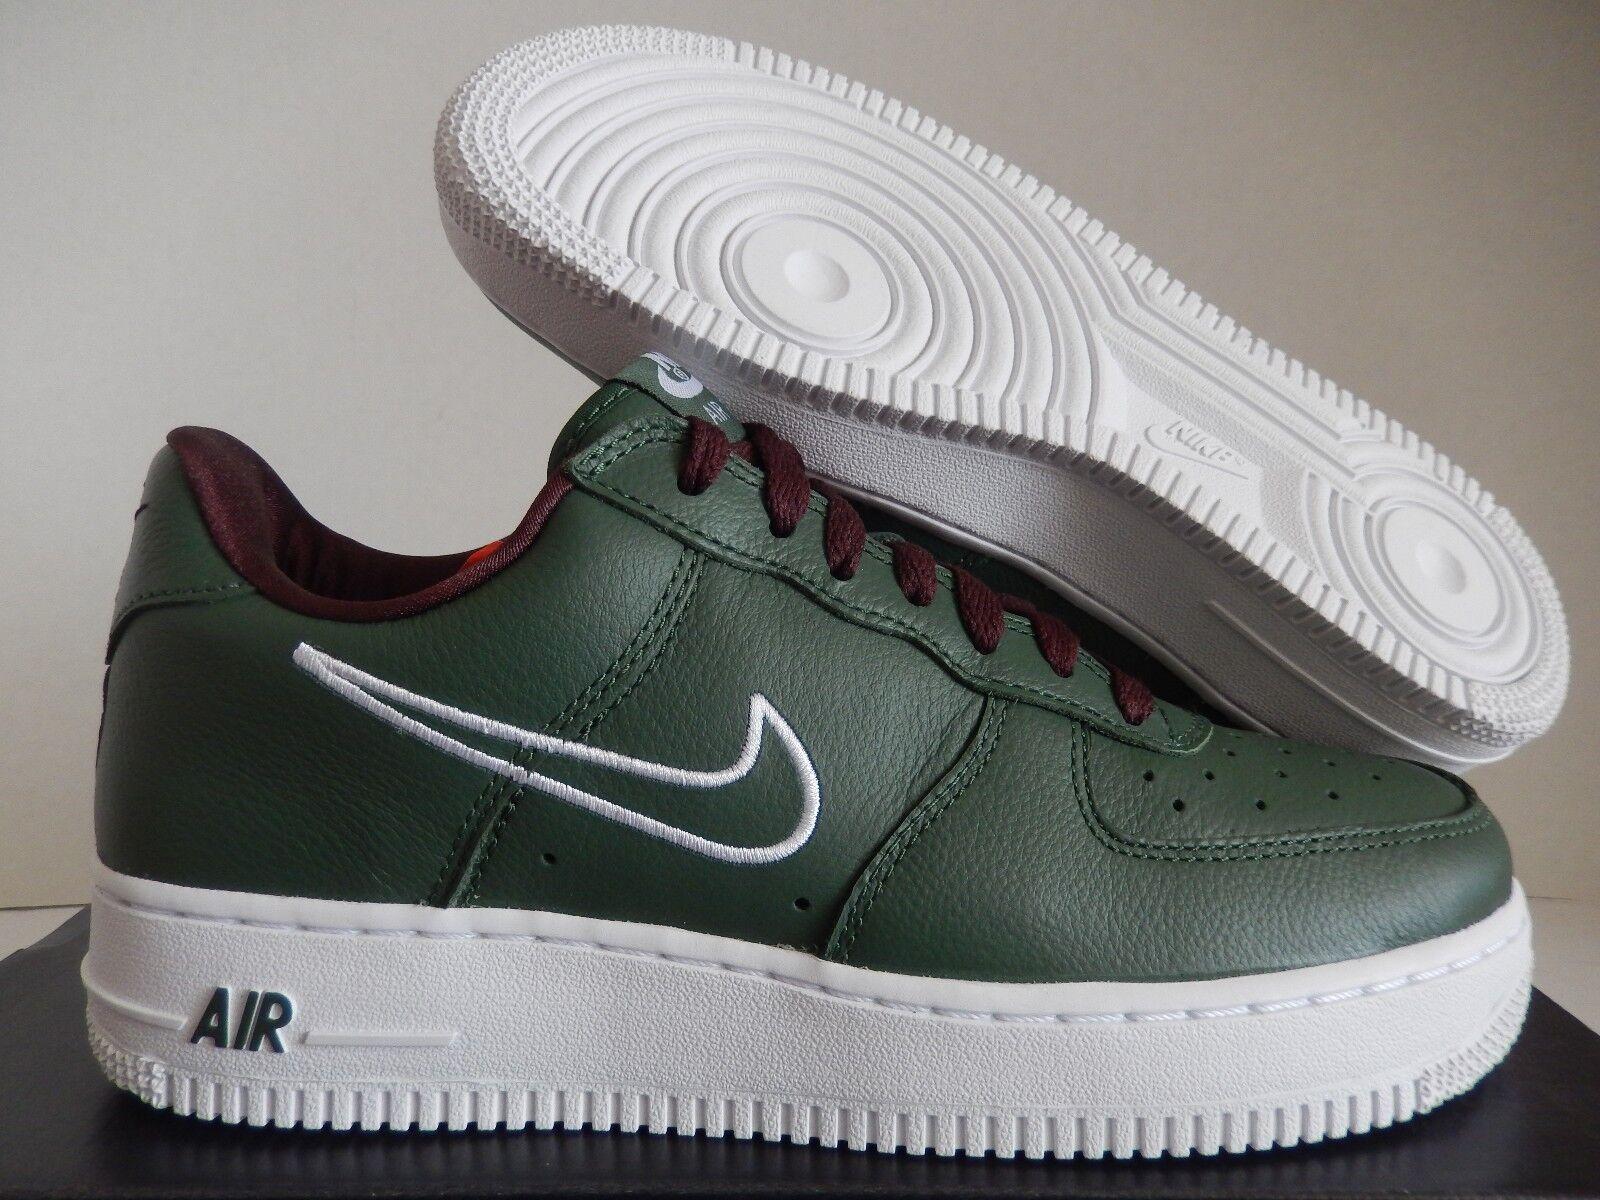 Nike air force 1 basso retrò hong kong profonda foresta green-white sz 7 [845053-300]